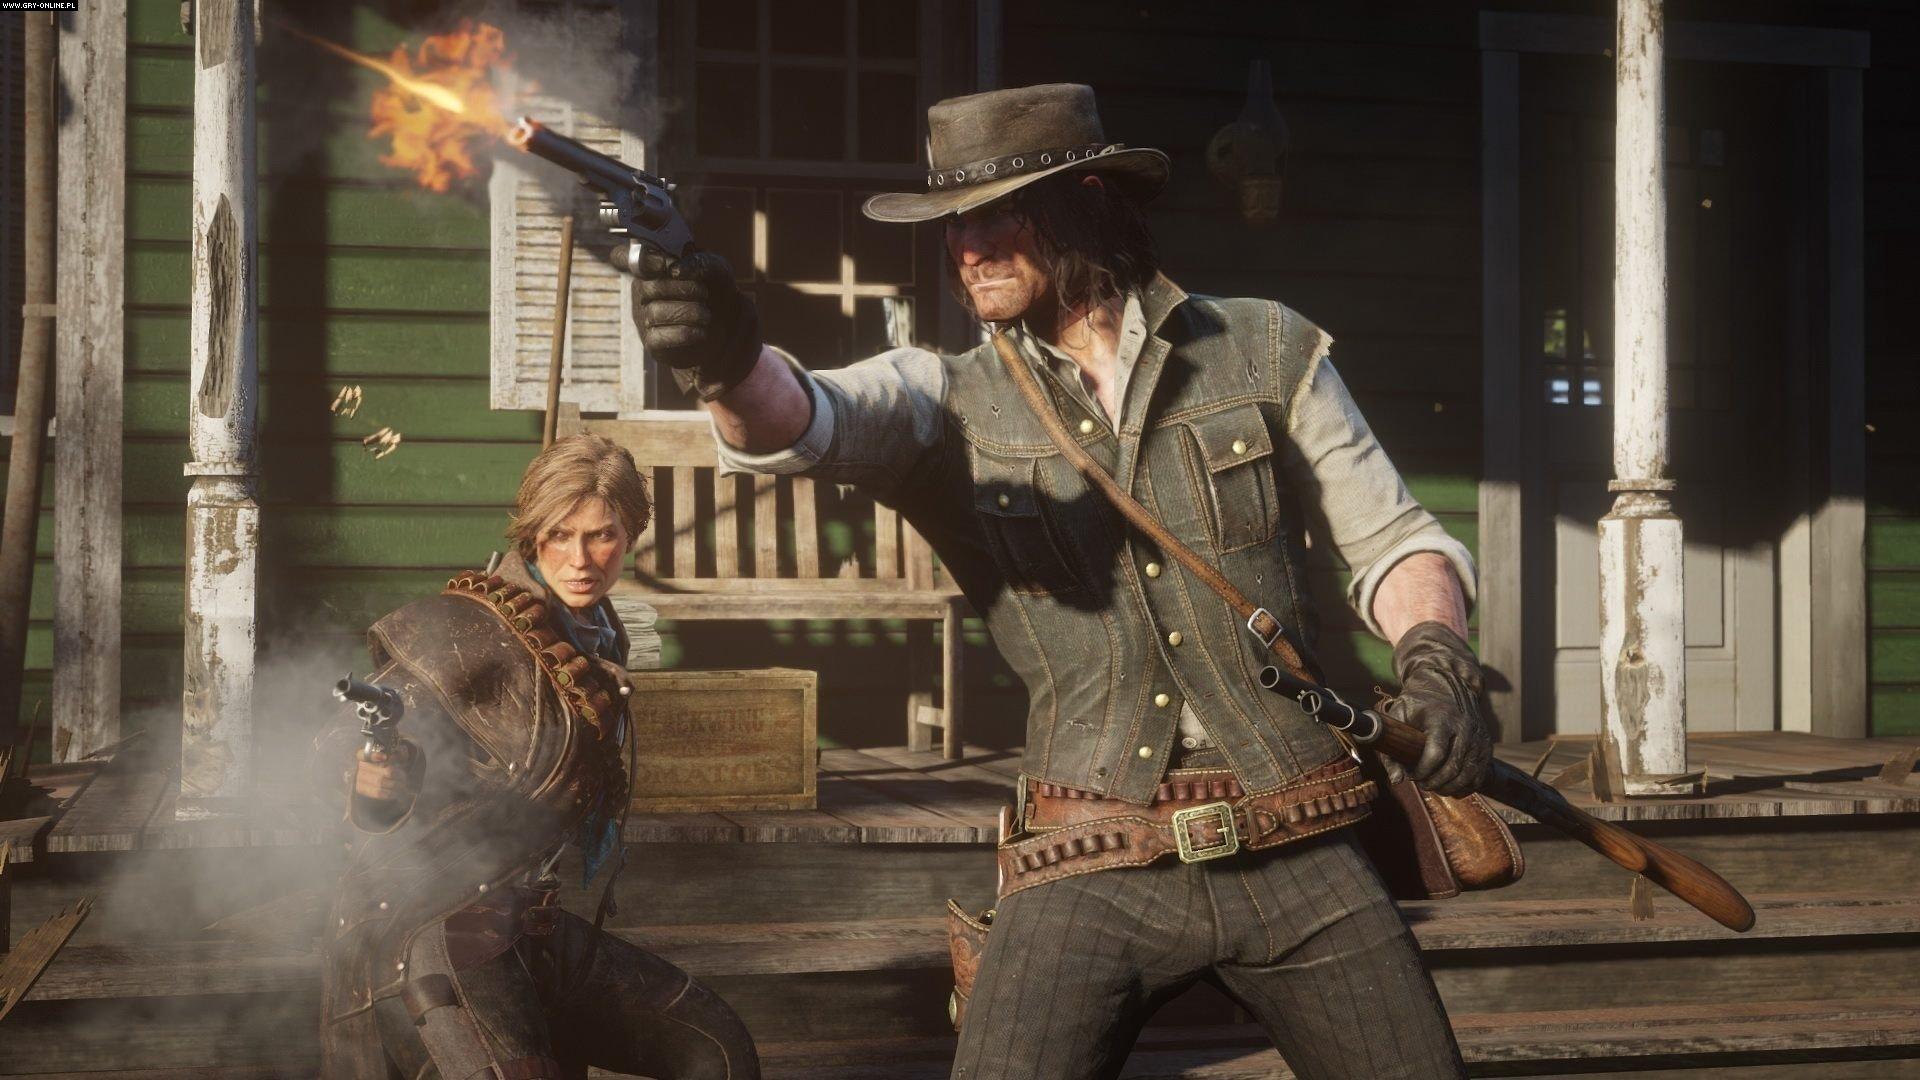 Red Dead Redemption II PS4, XONE Games Image 9/55, Rockstar Games